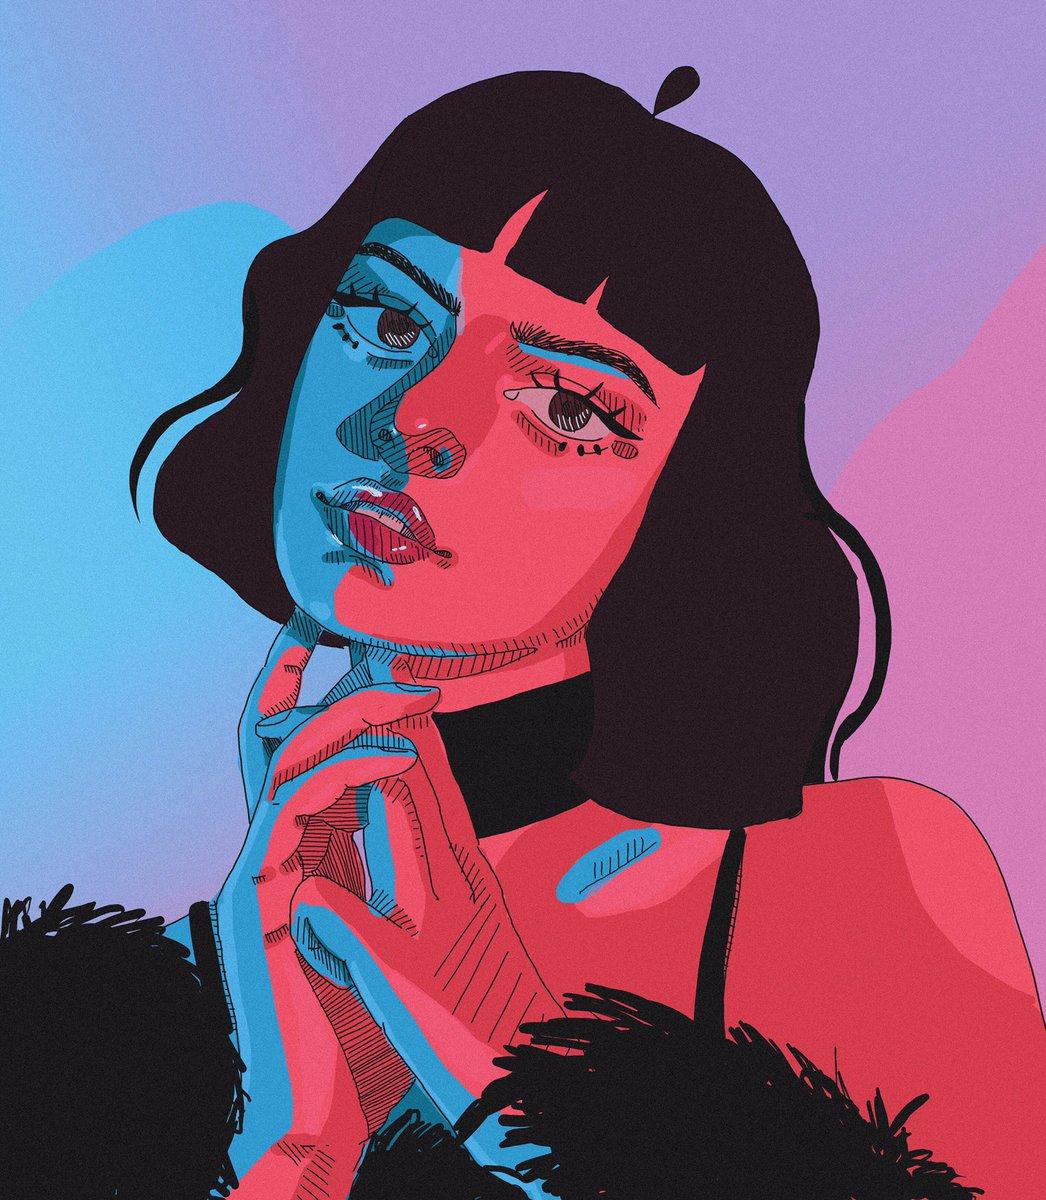 RT @layana_chan: #drawing #dessin #art #dessindujour #artoftheday #artist #aesthetic #digitalart https://t.co/5mfmcMBD9j